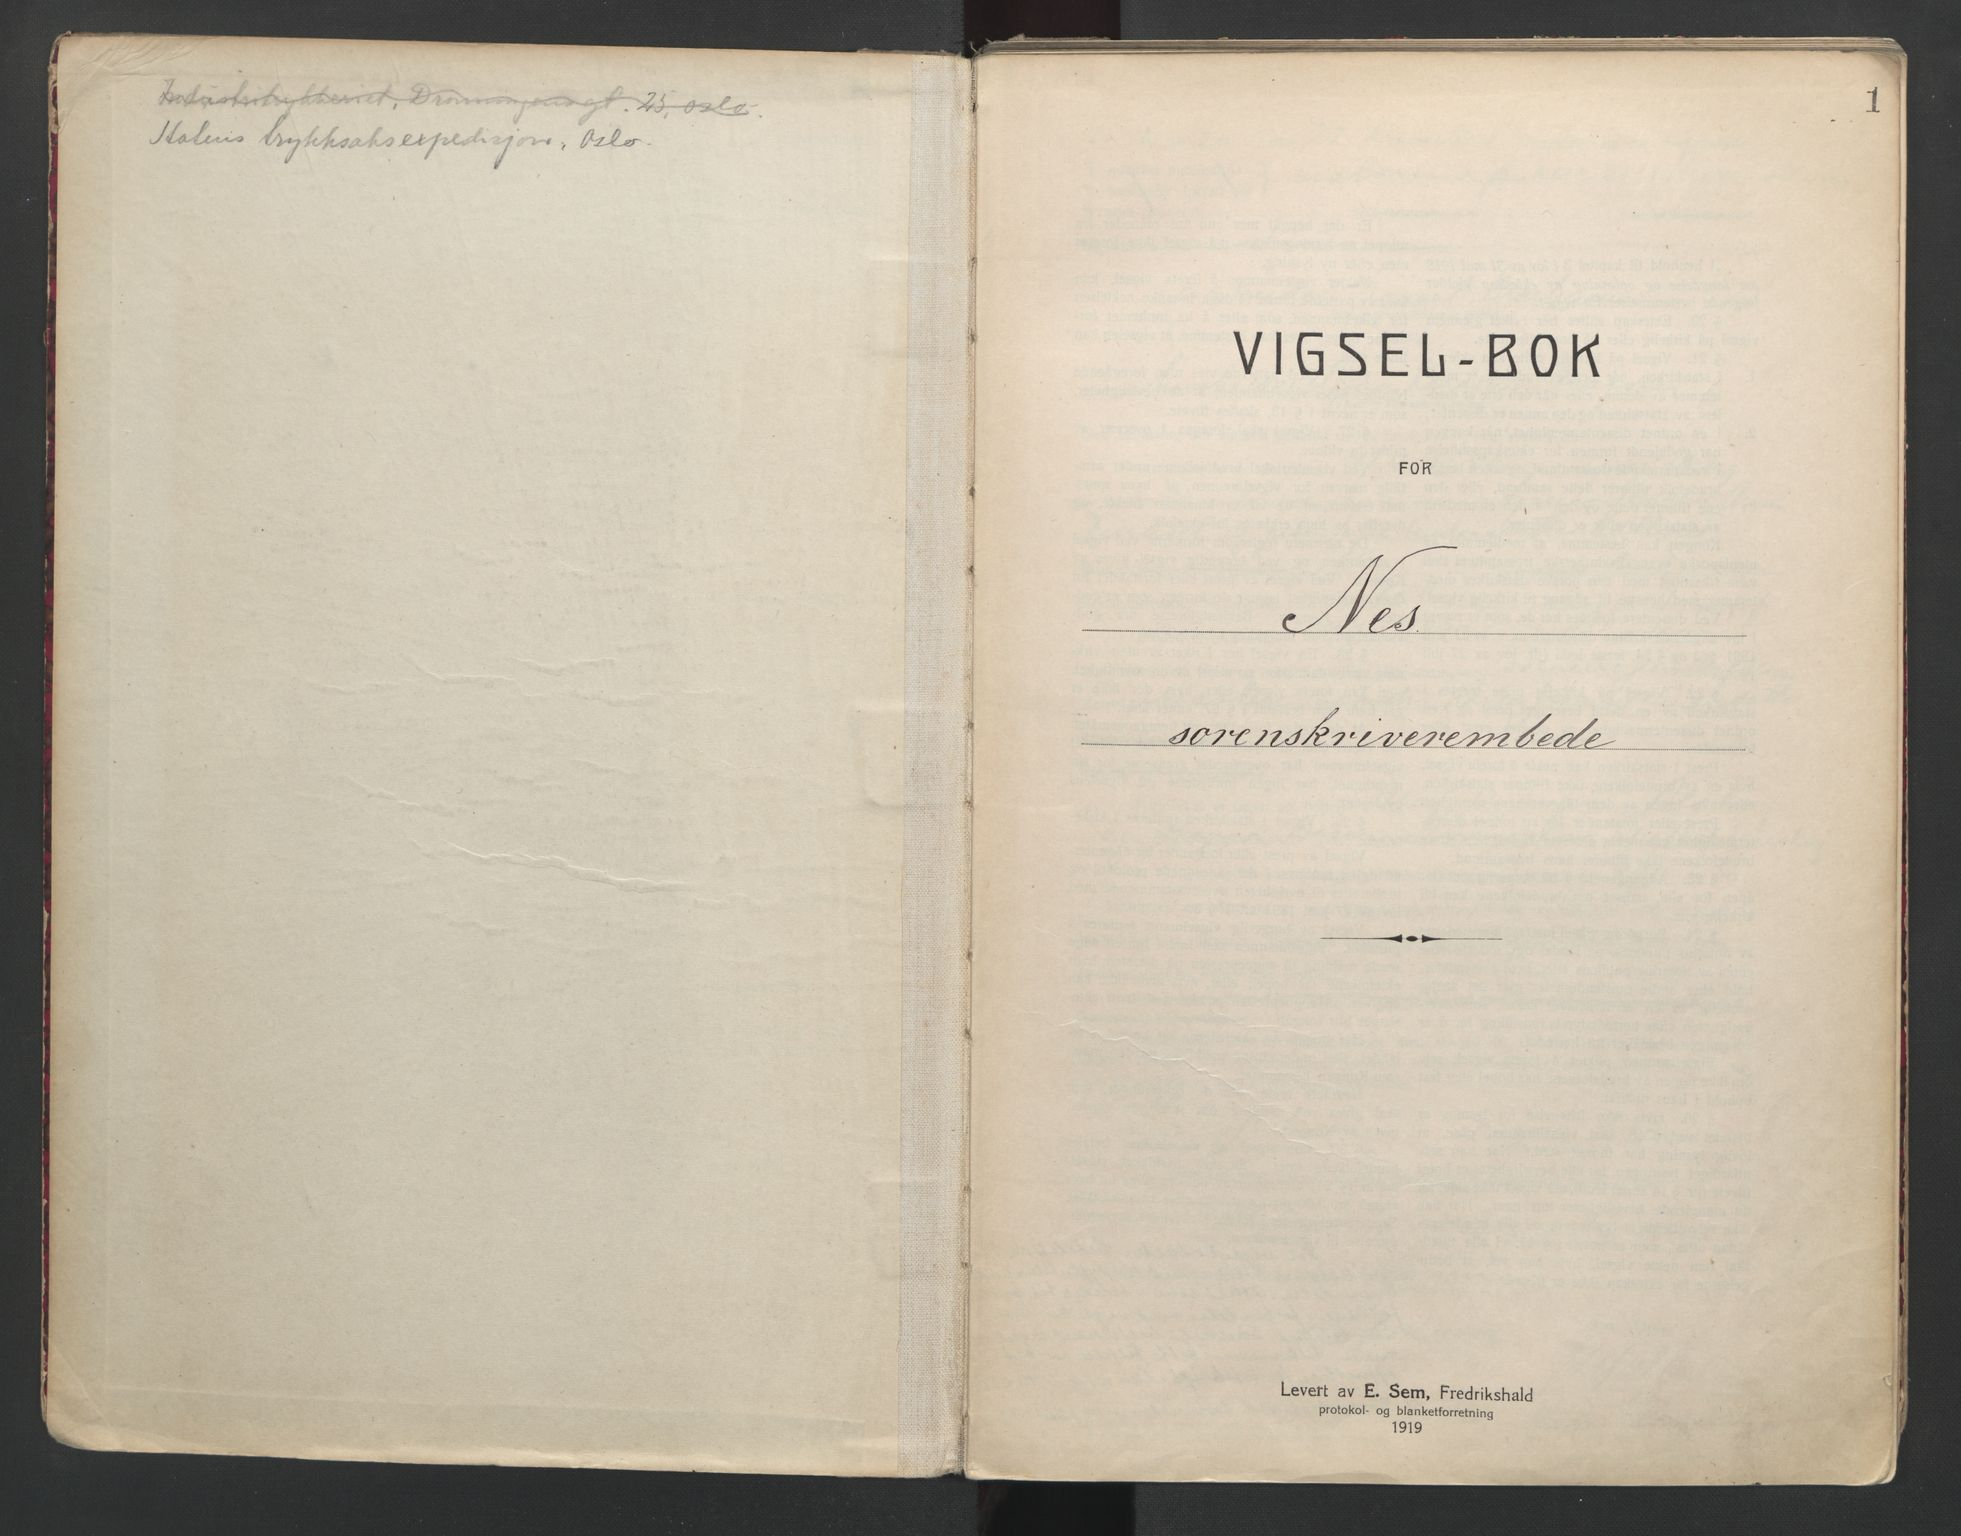 SAO, Nes tingrett, L/Lc/Lca/L0001: Vigselbok, 1920-1943, s. 1